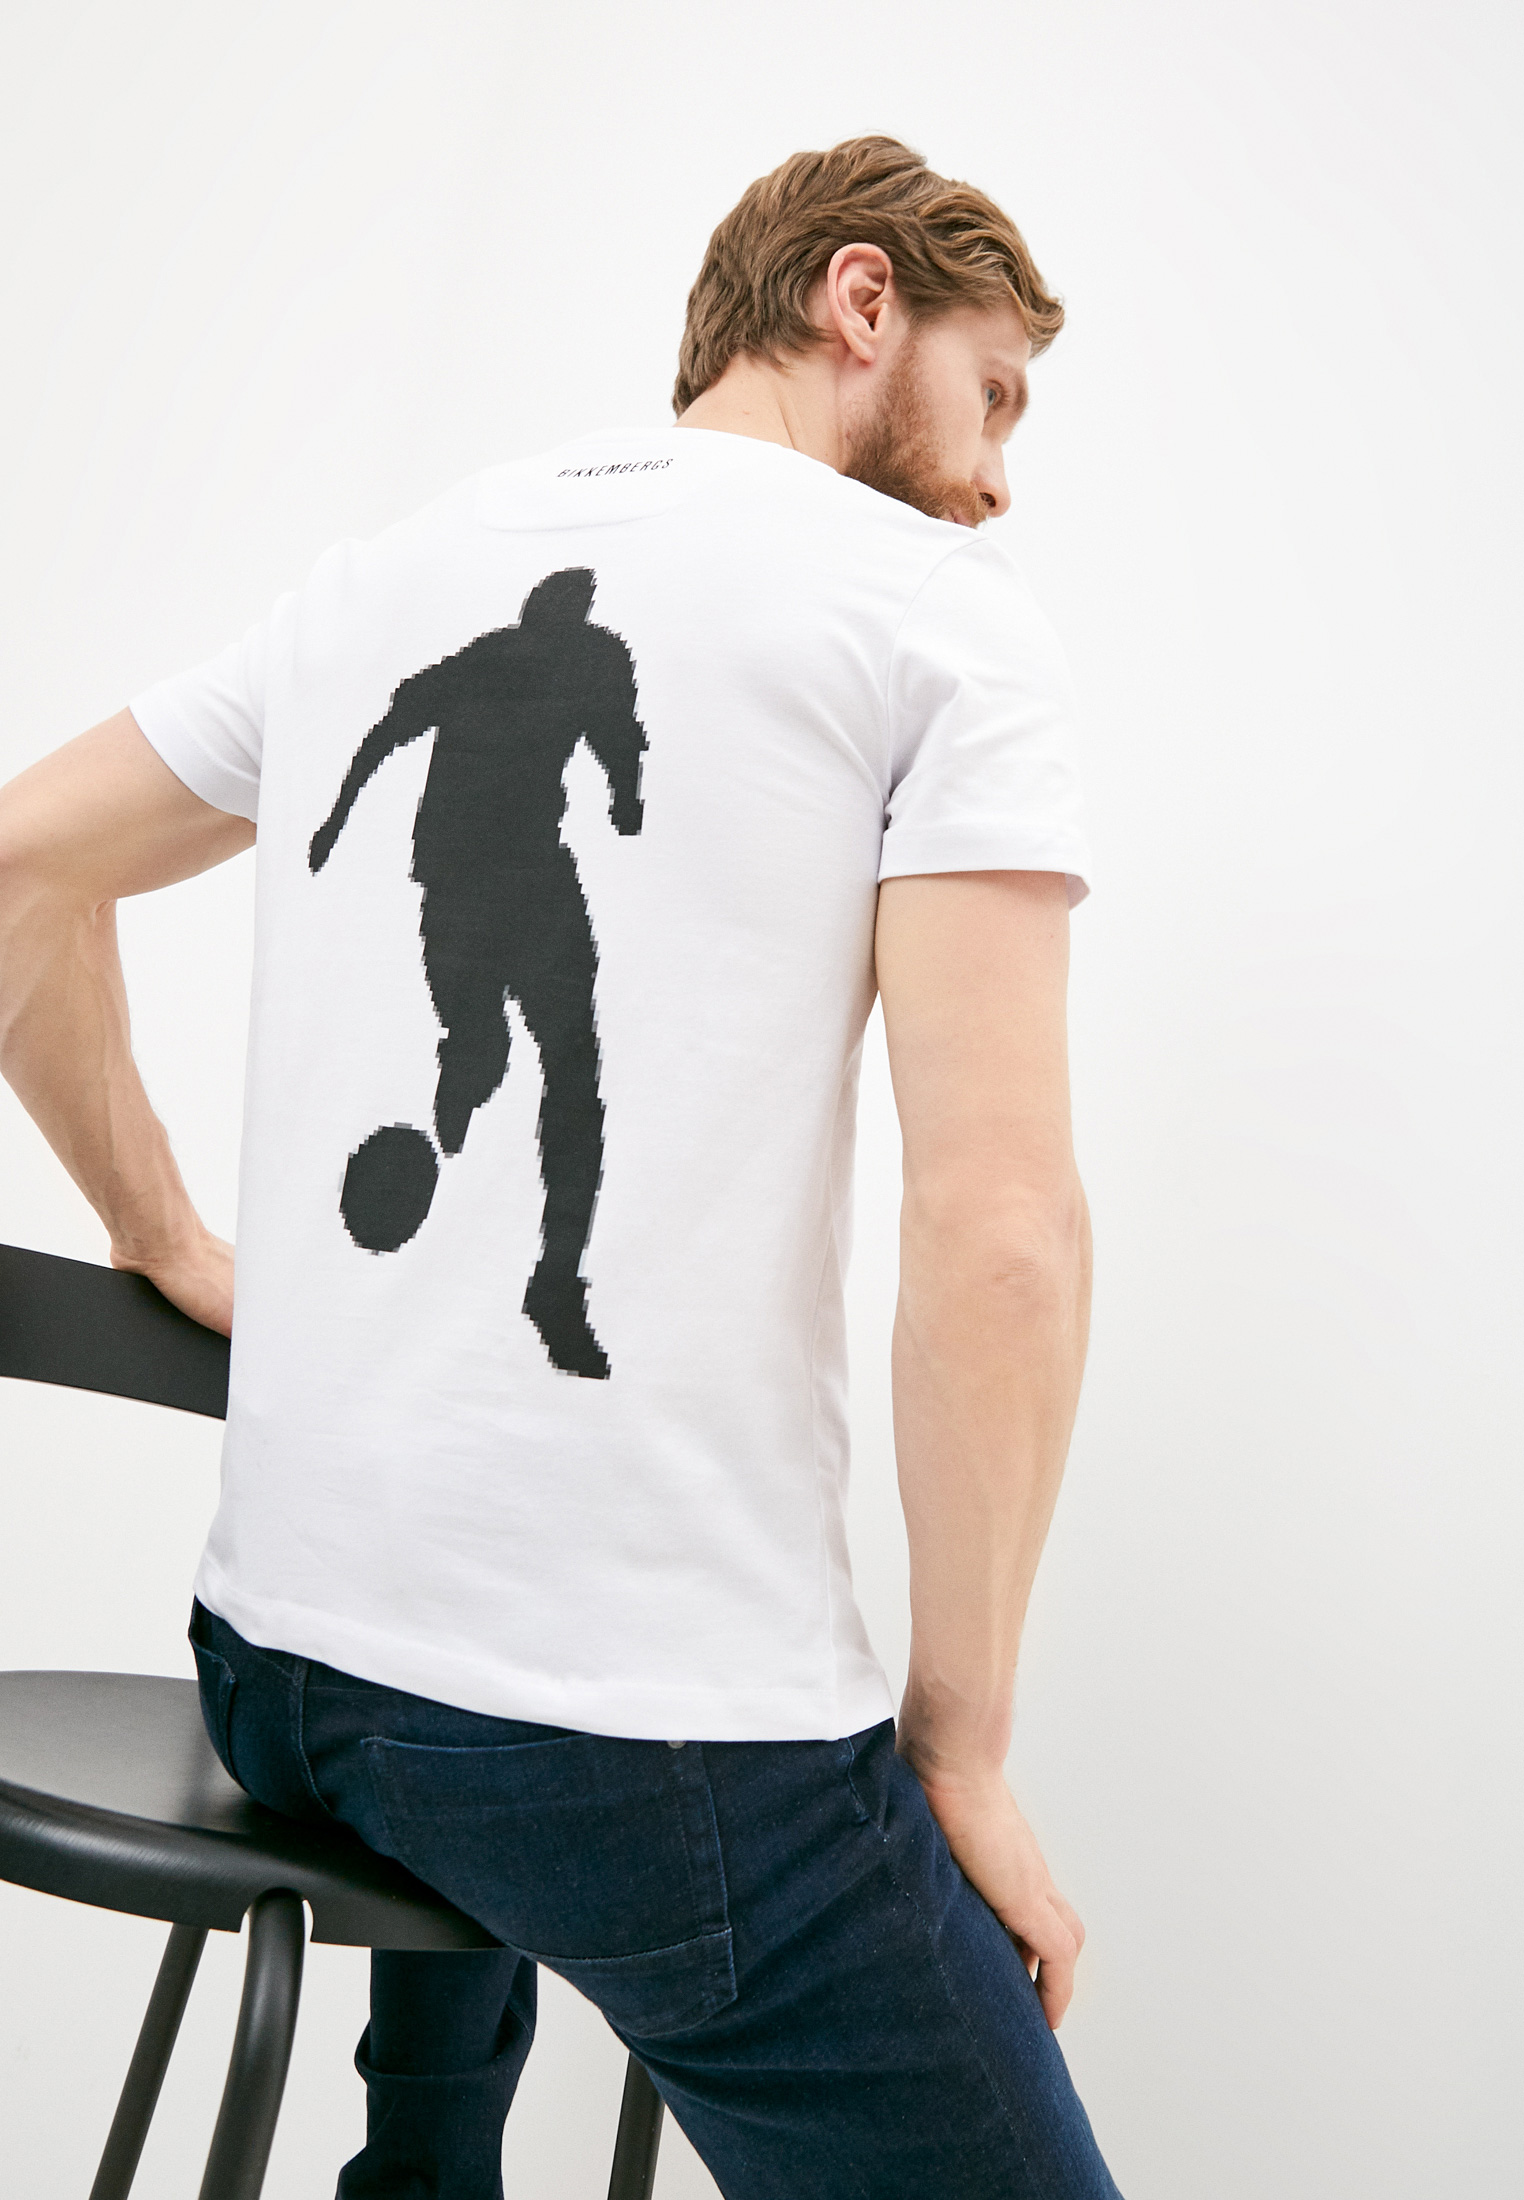 Мужская футболка Bikkembergs (Биккембергс) C 4 101 02 E 2231